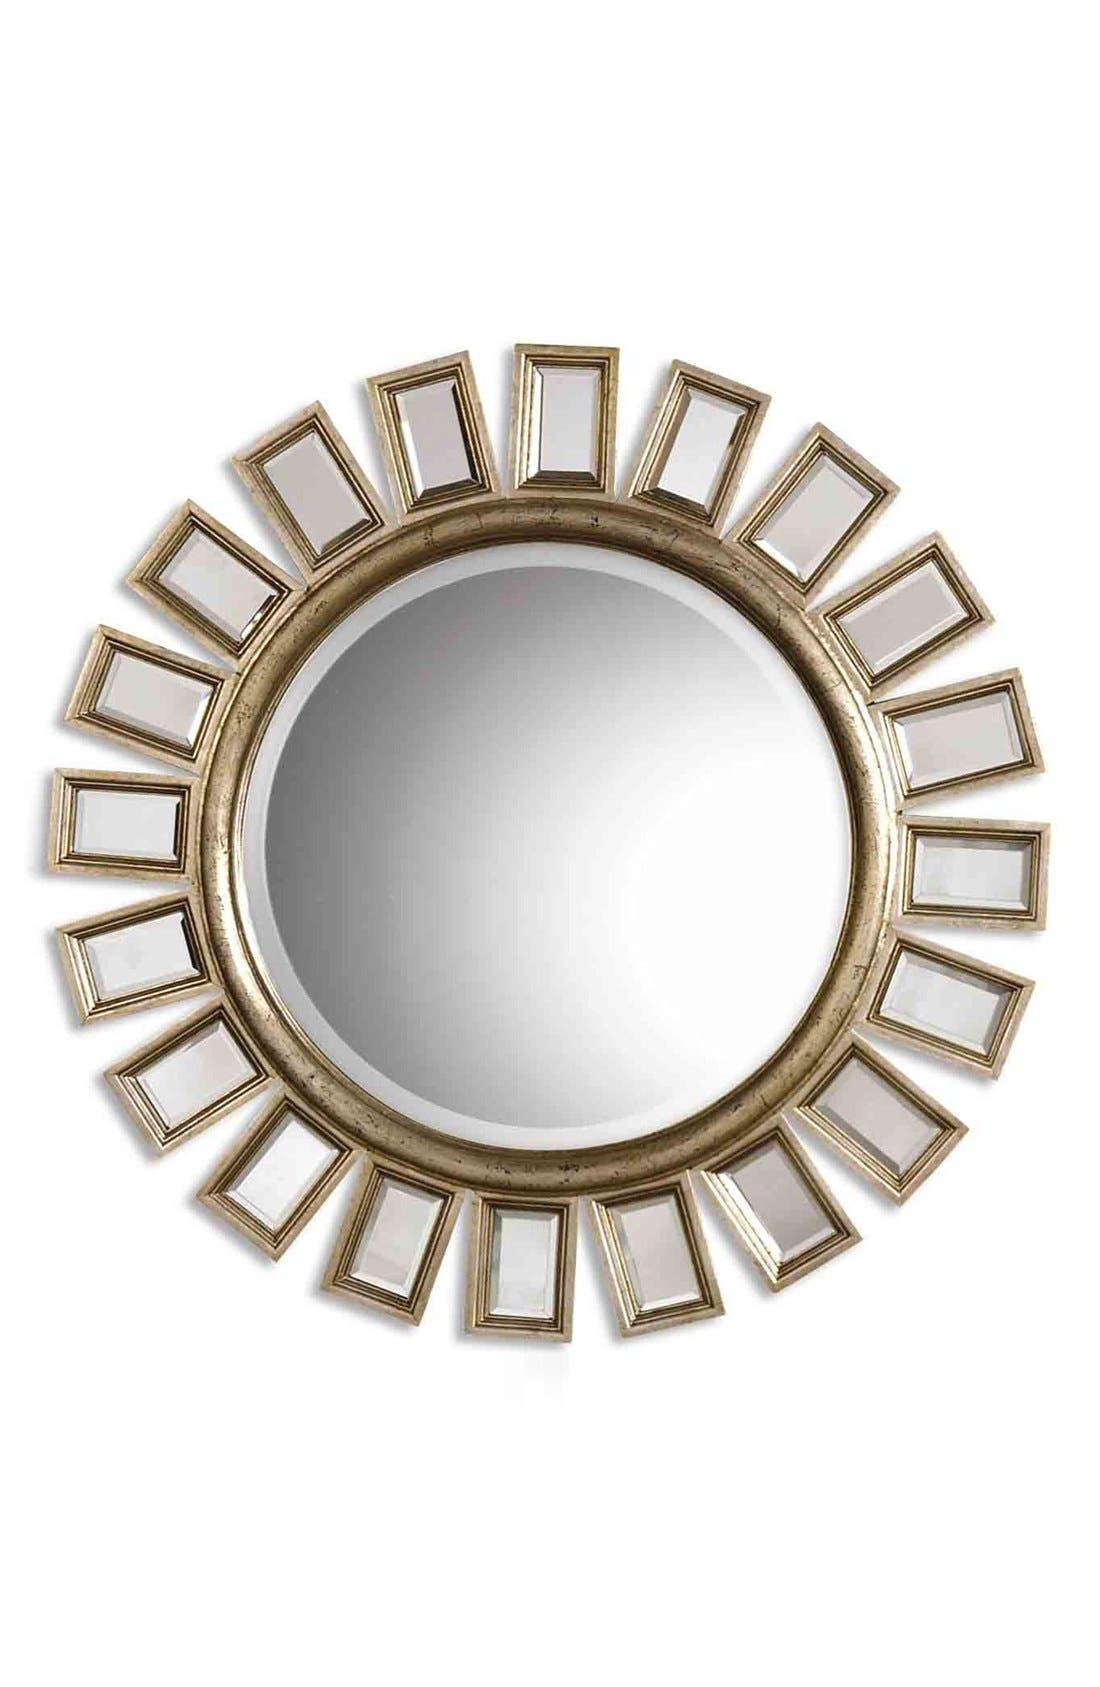 'Cyrus' Round Mirror,                             Main thumbnail 1, color,                             020